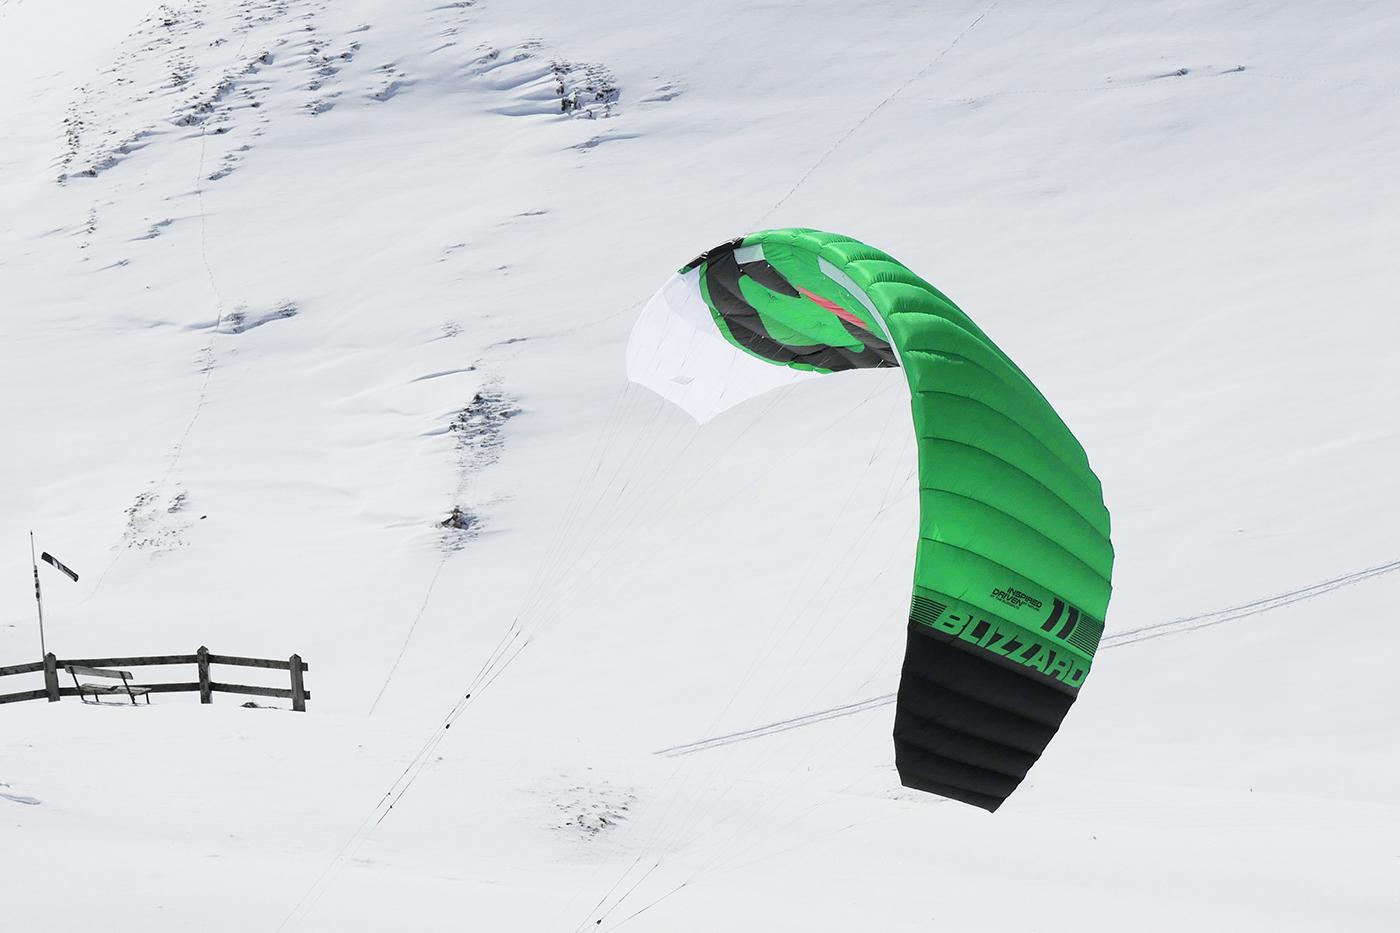 RideUP test the Ozone Blizzard